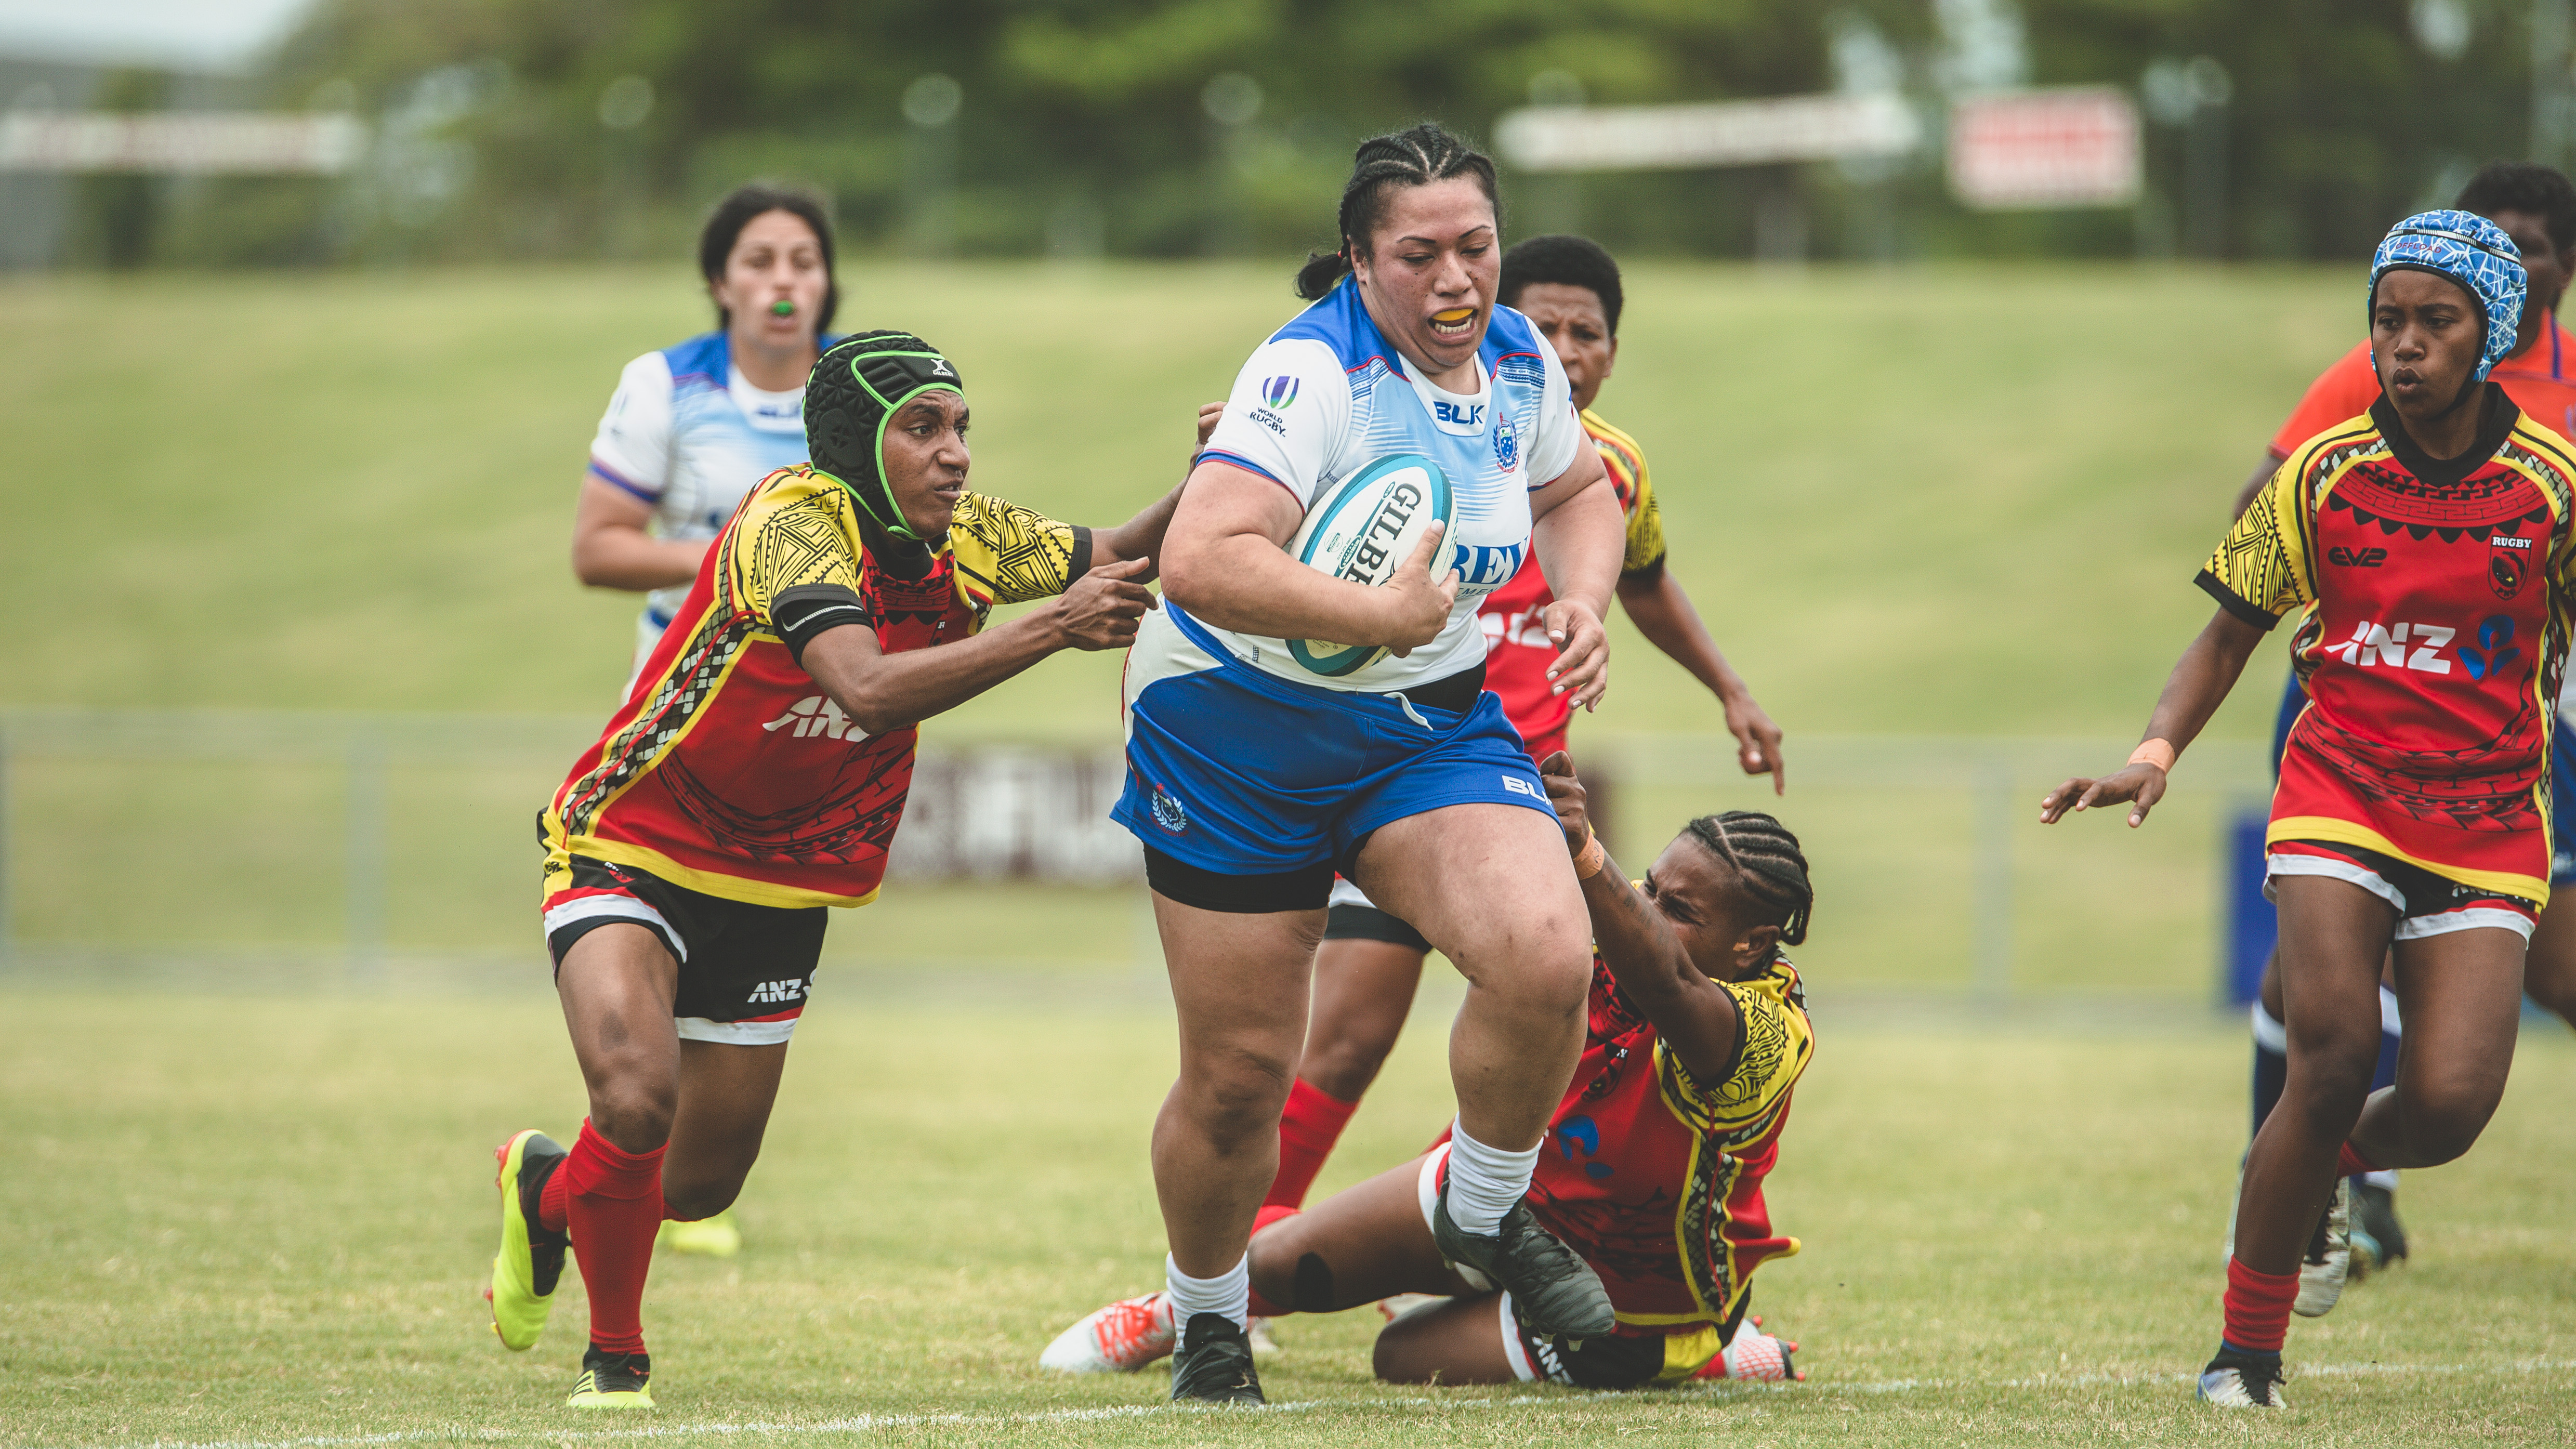 Big wins for Samoa and Black Ferns Development XV at